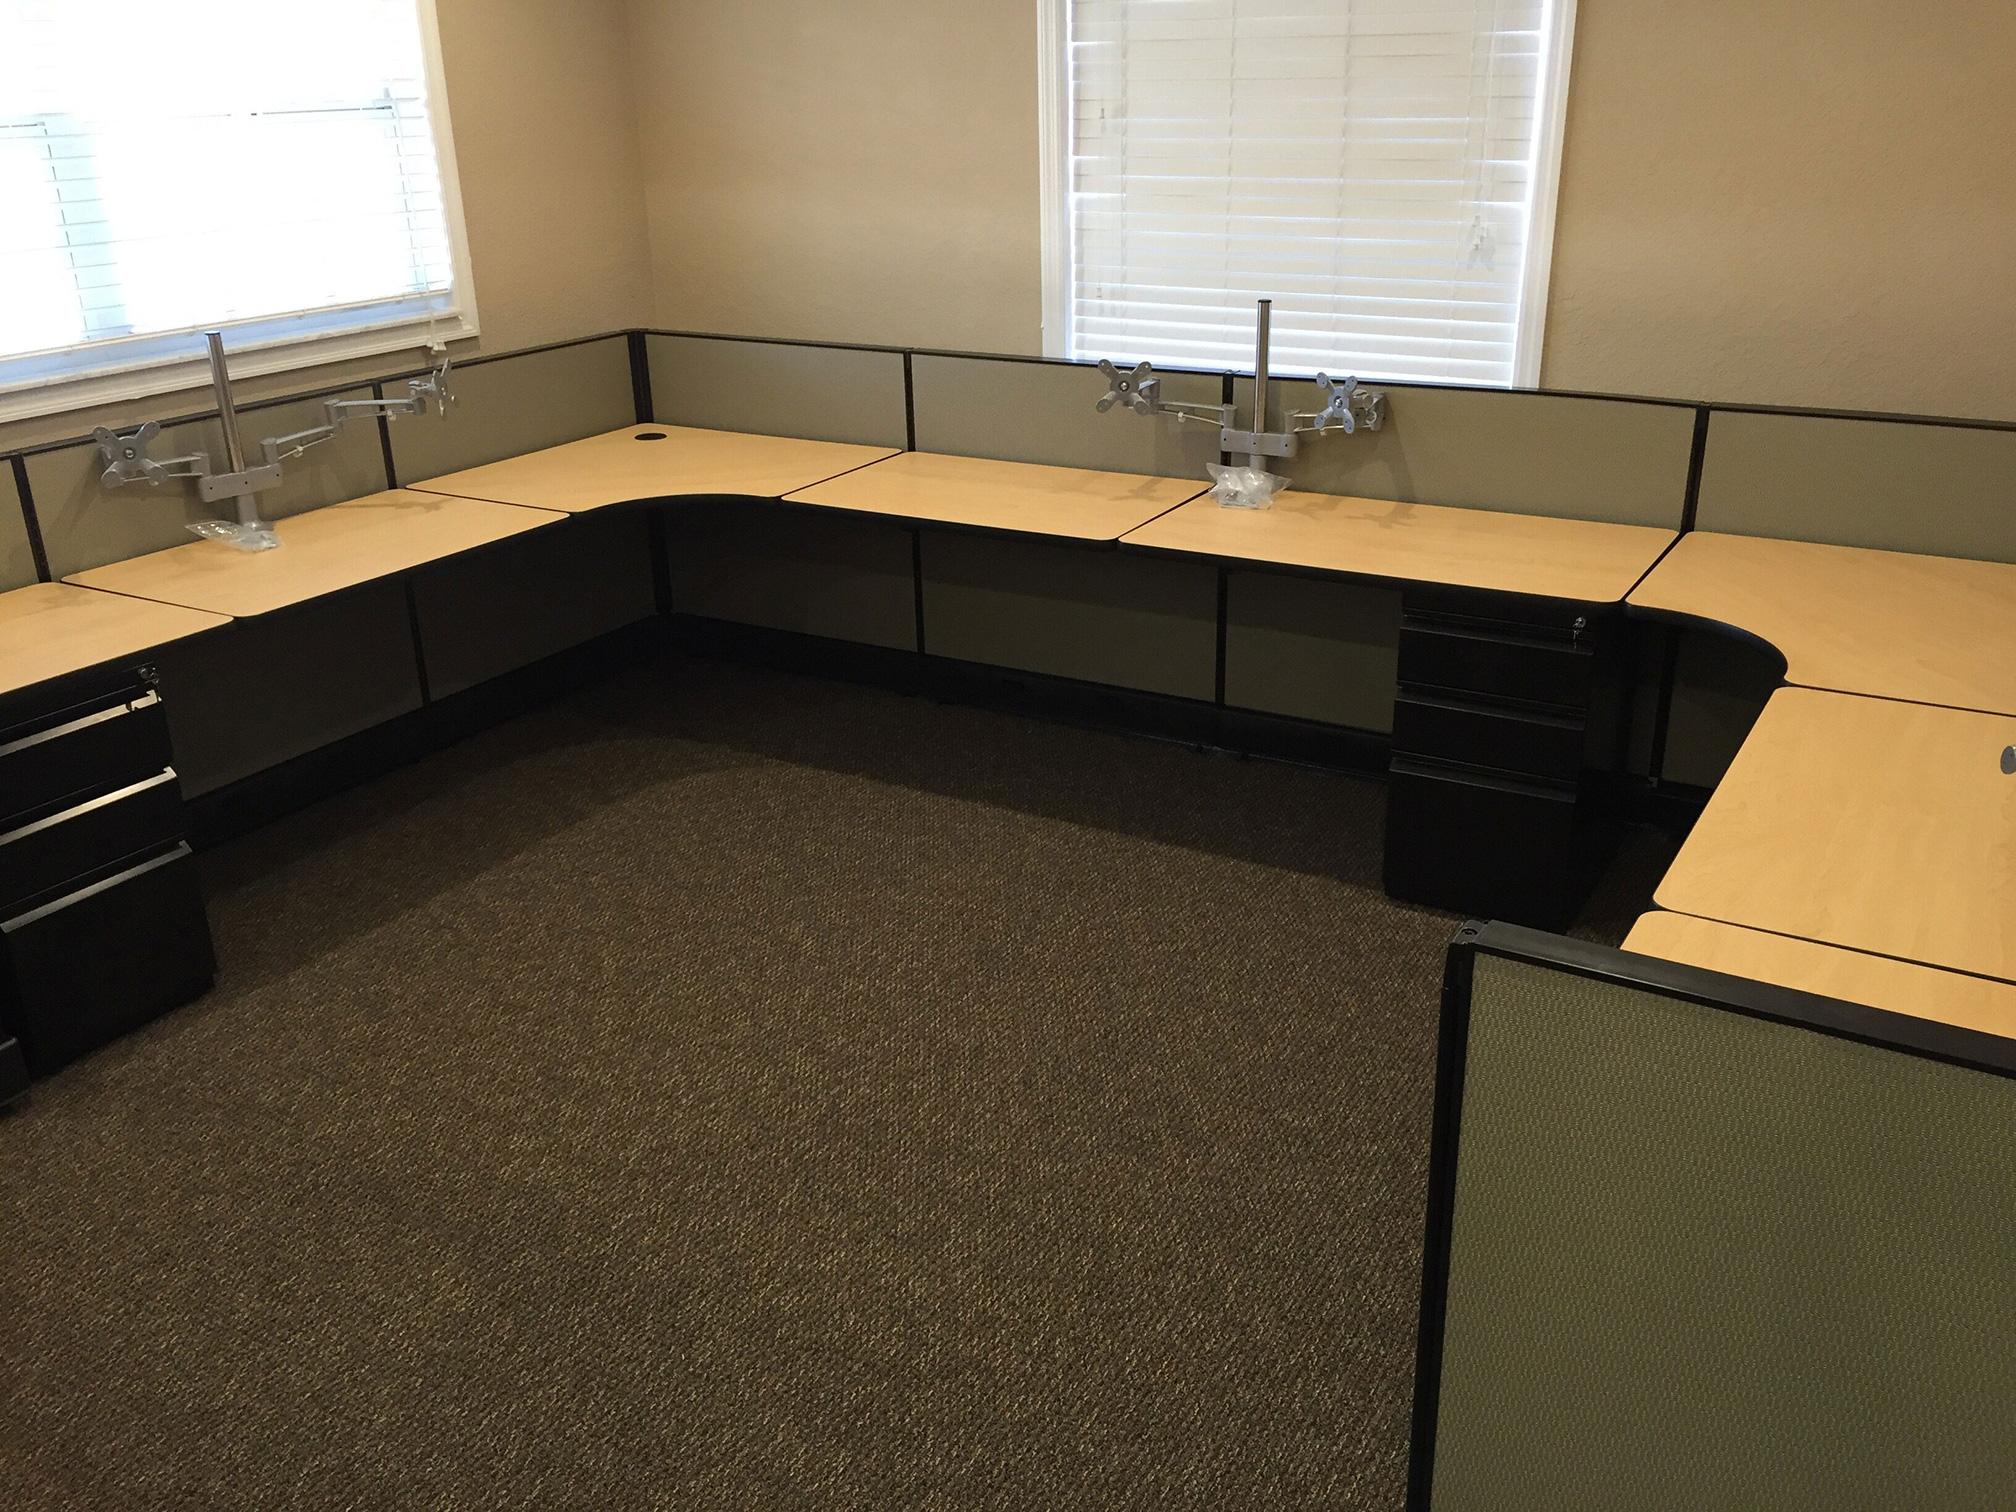 office-cubicles-for-sale-in-altamonte-springs-florida-3-2.jpg